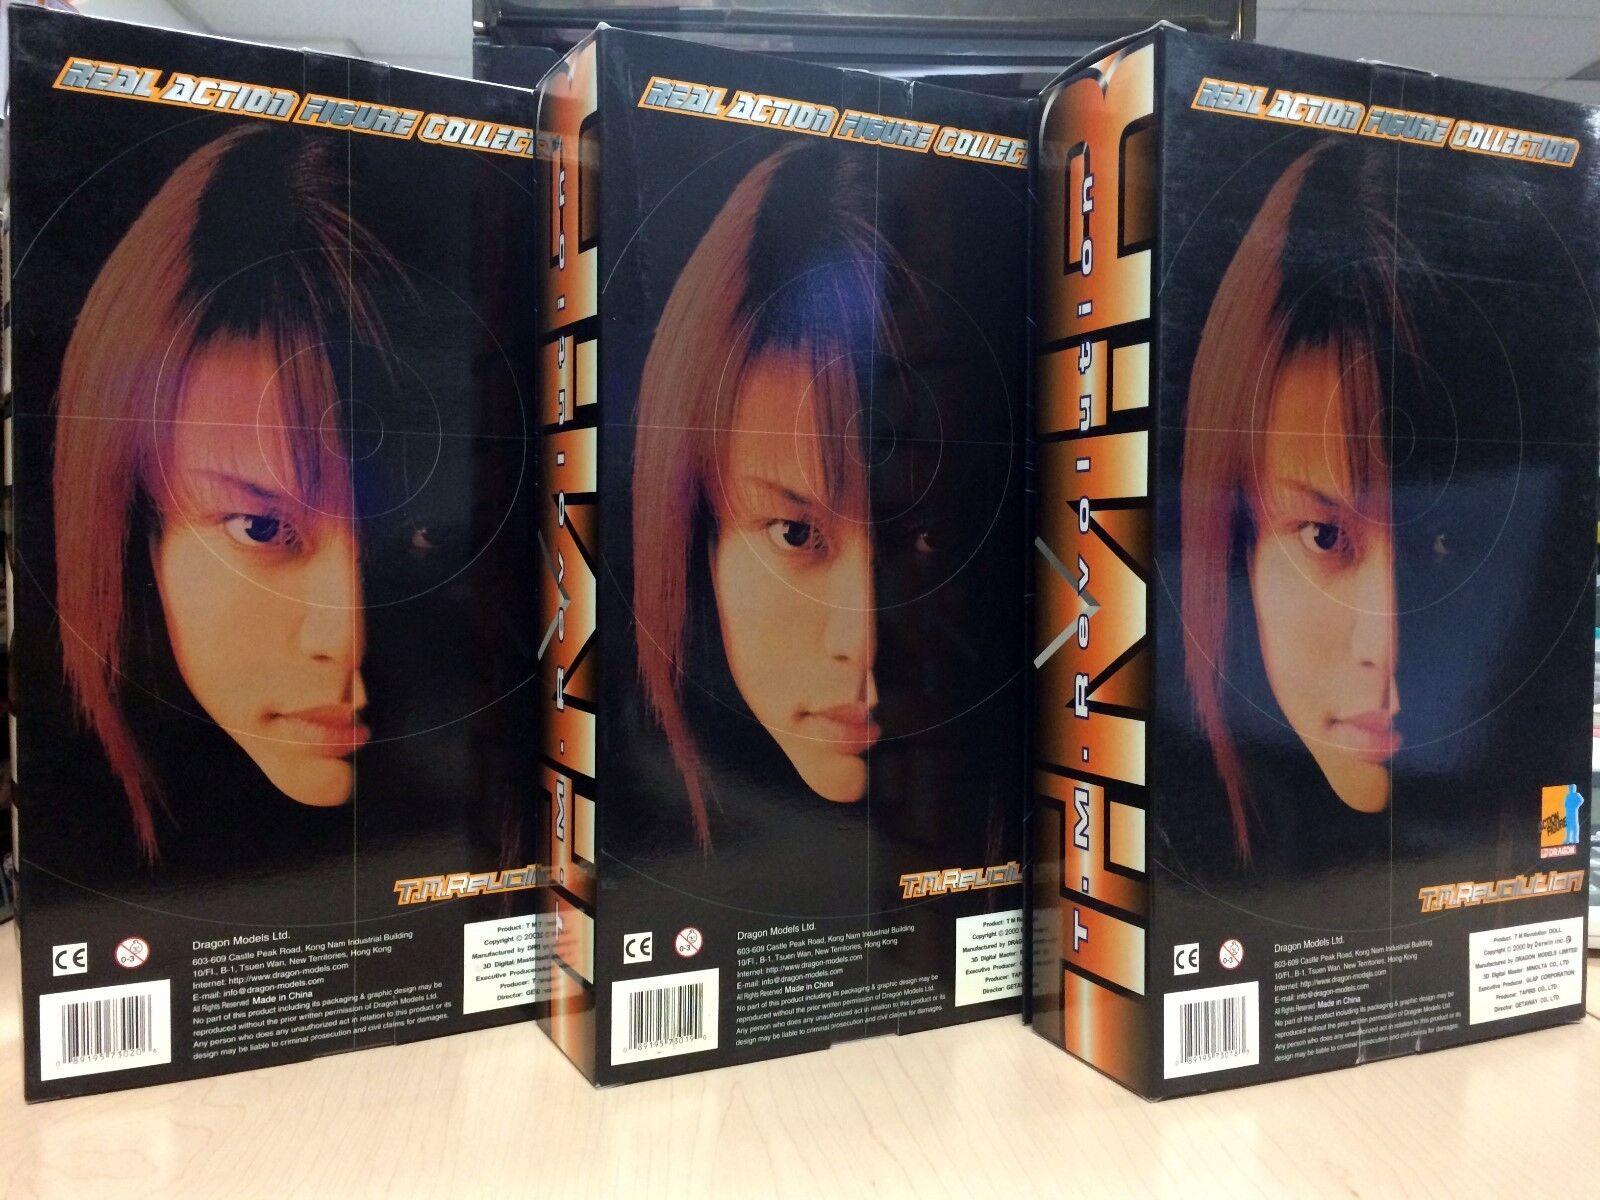 DRAGON 1 6 T.M.Revolution Takanori Nishikawa 3 cifras Japan Exclusive Exclusive Exclusive RARE MIB 79355b